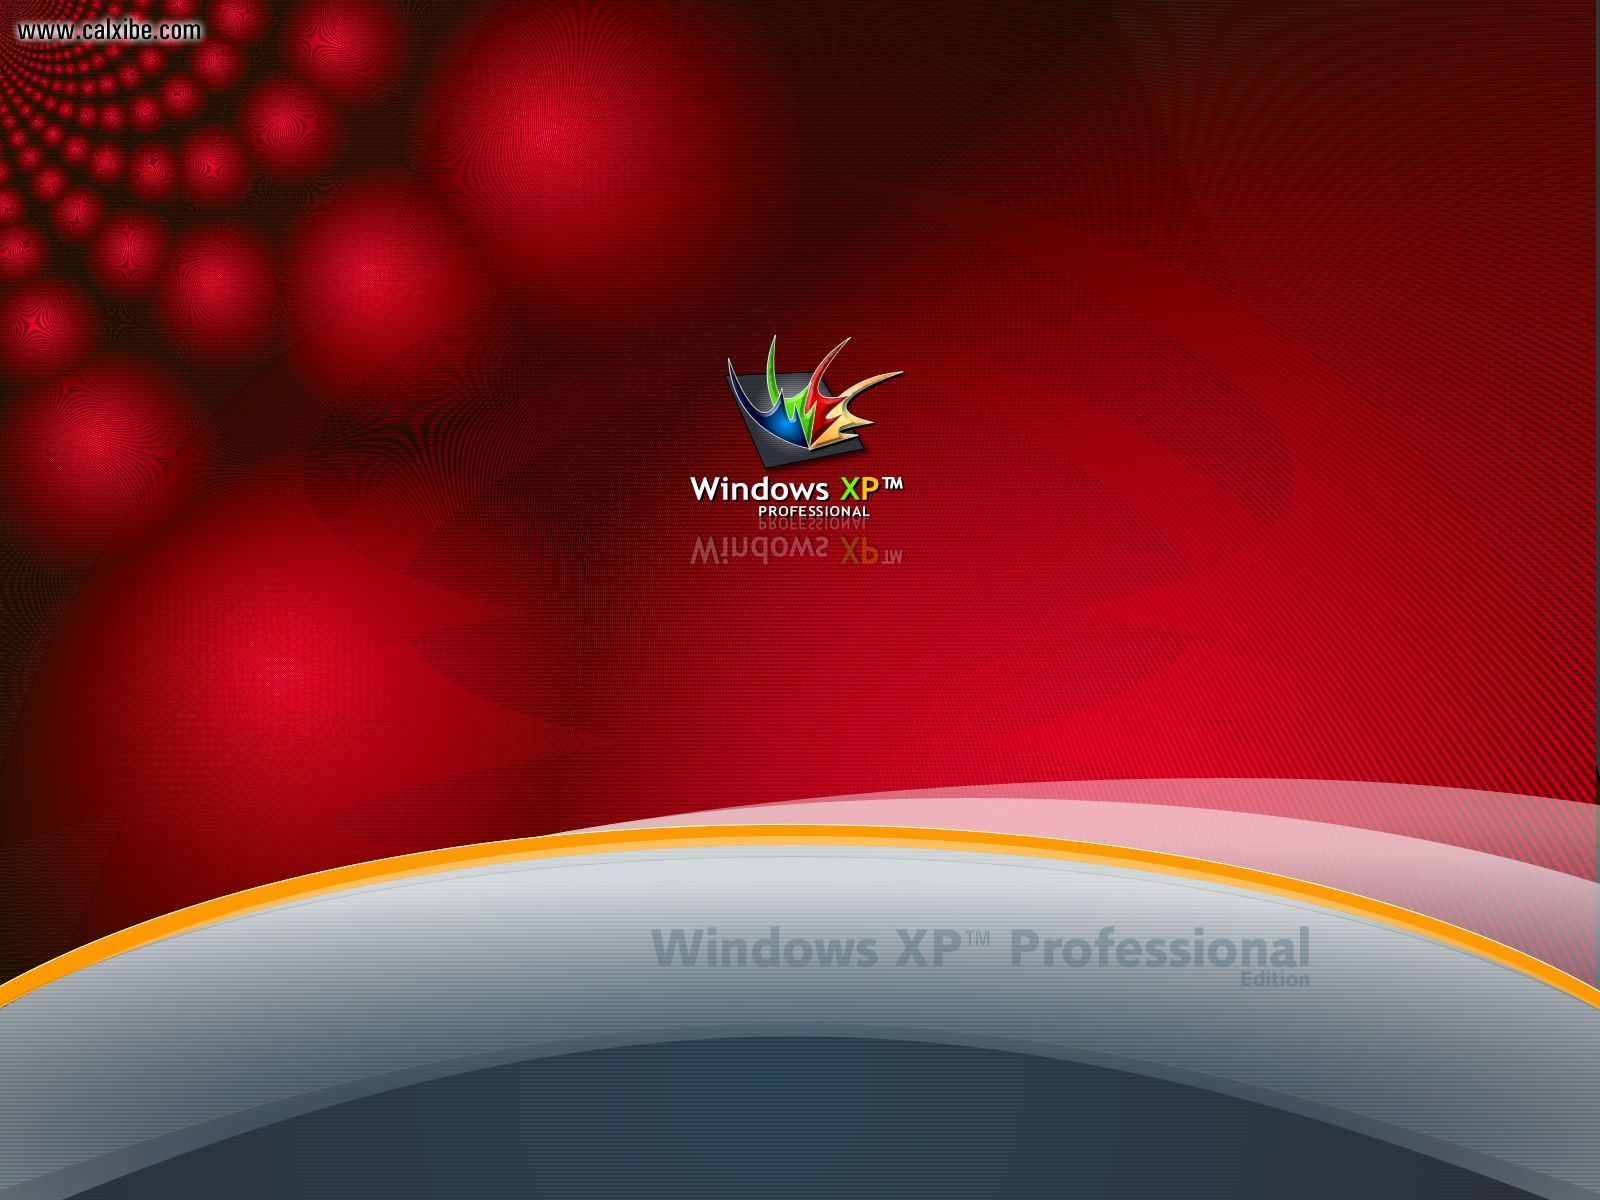 download windows xp professional